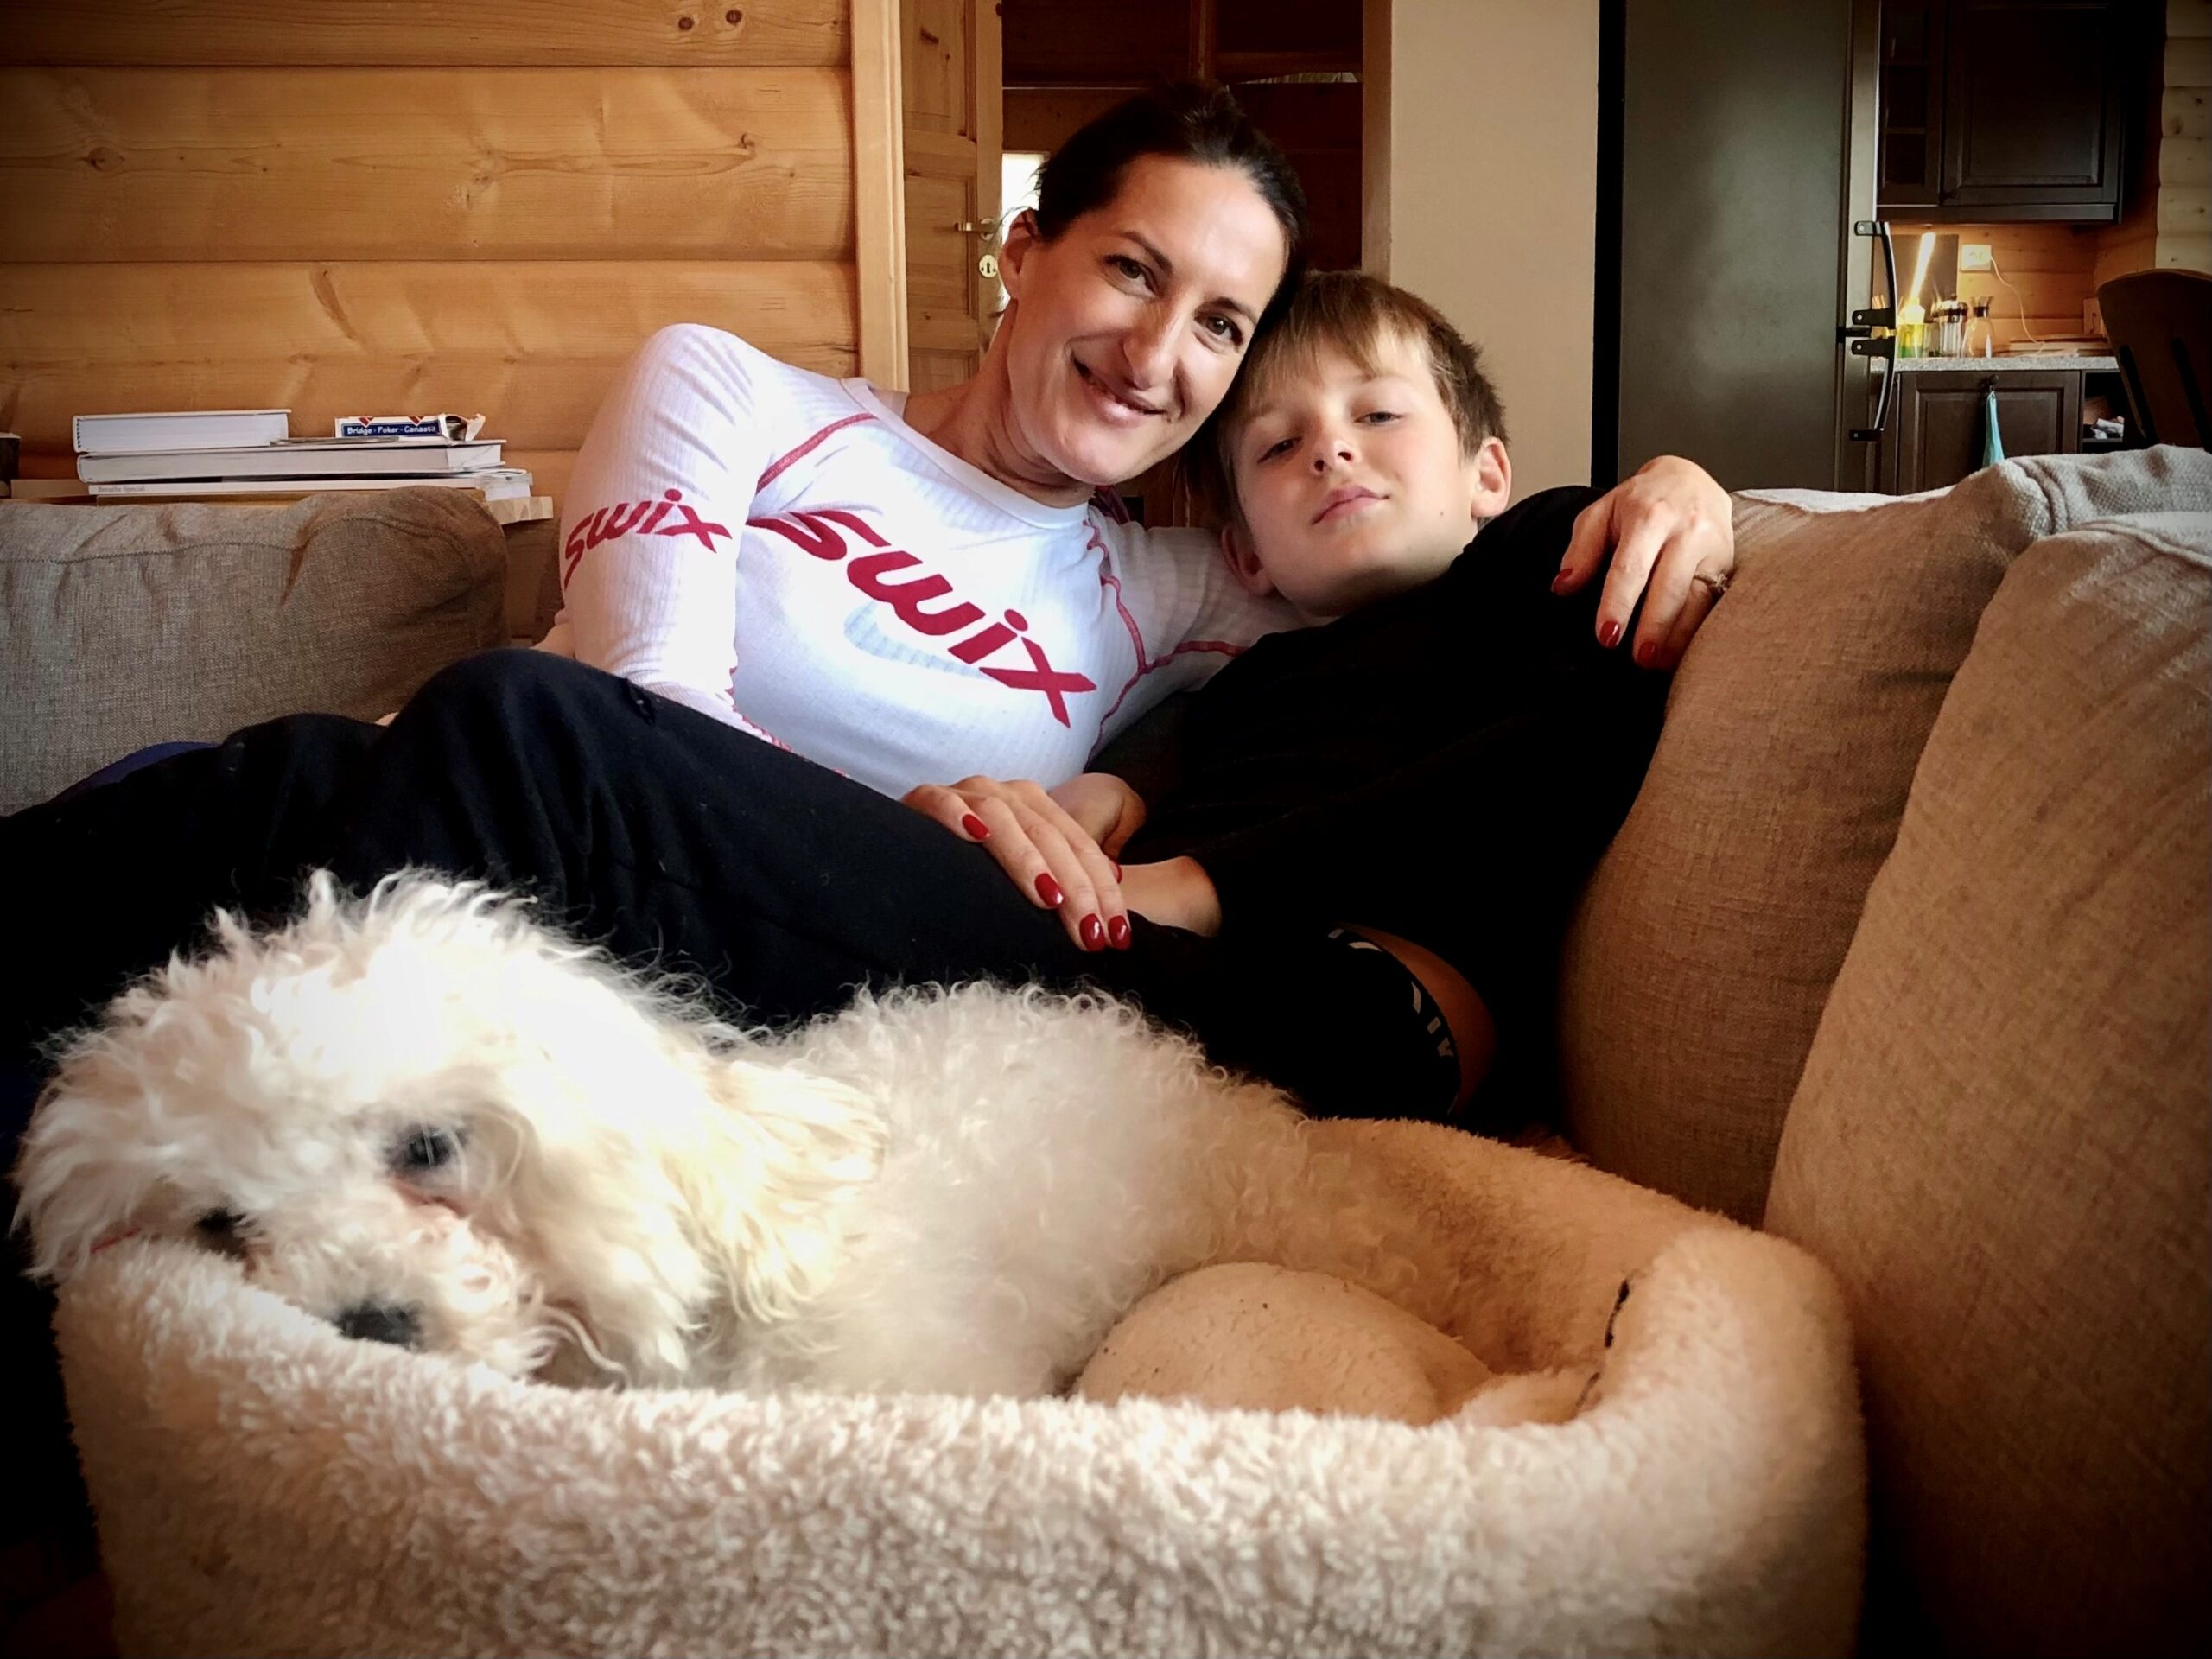 Rachel and her son